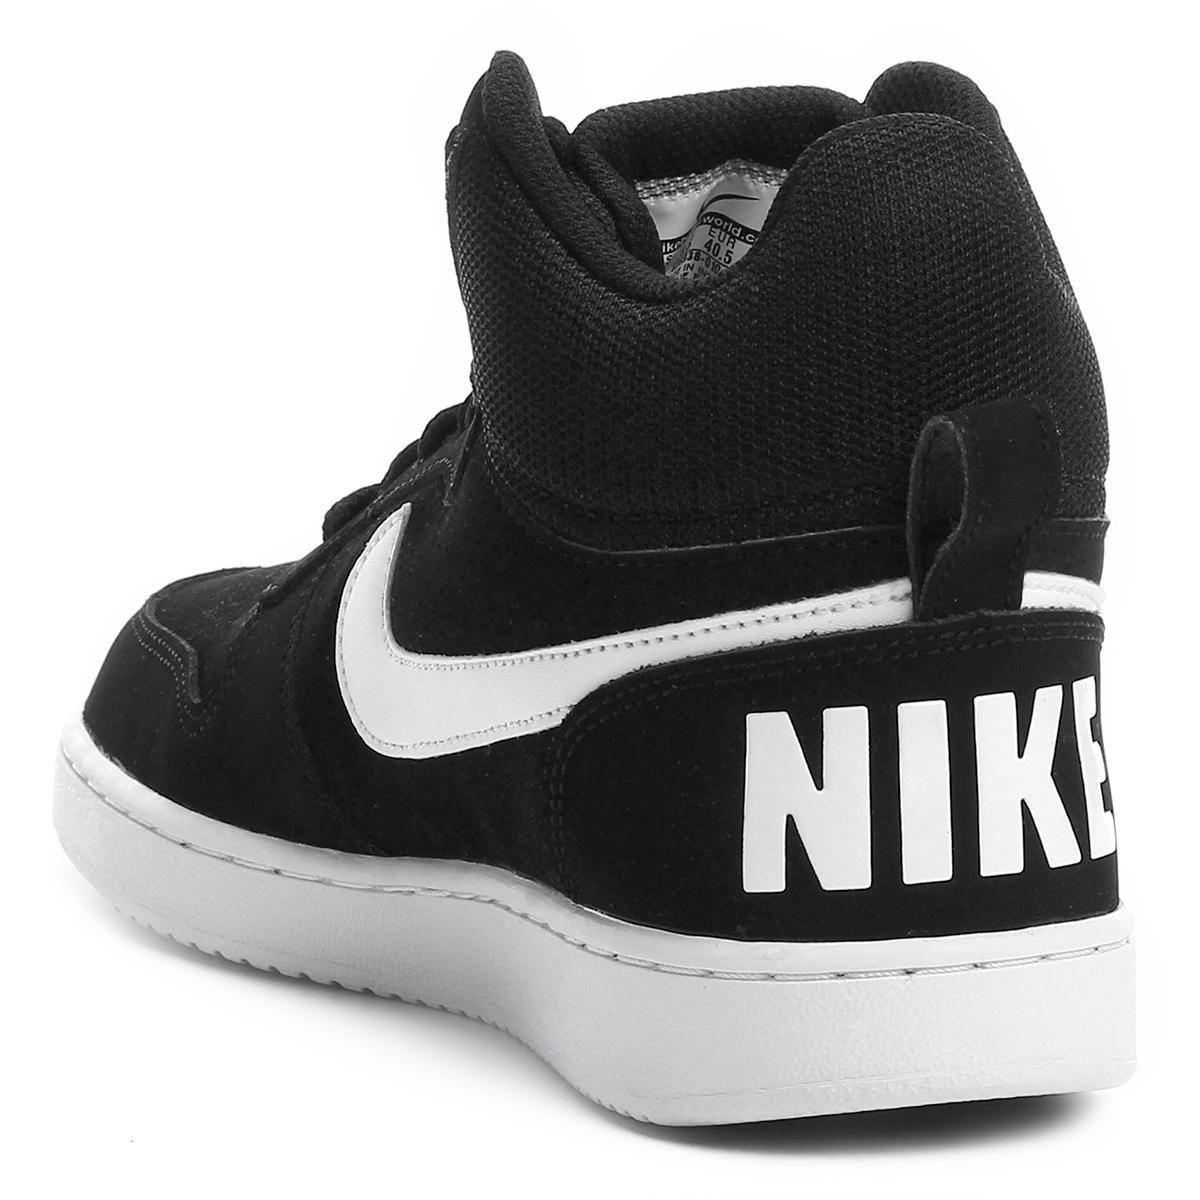 70e59e7004c61 Tênis Masculino Cano Alto Nike Court Borough Mid - BRACIA SHOP  Loja ...